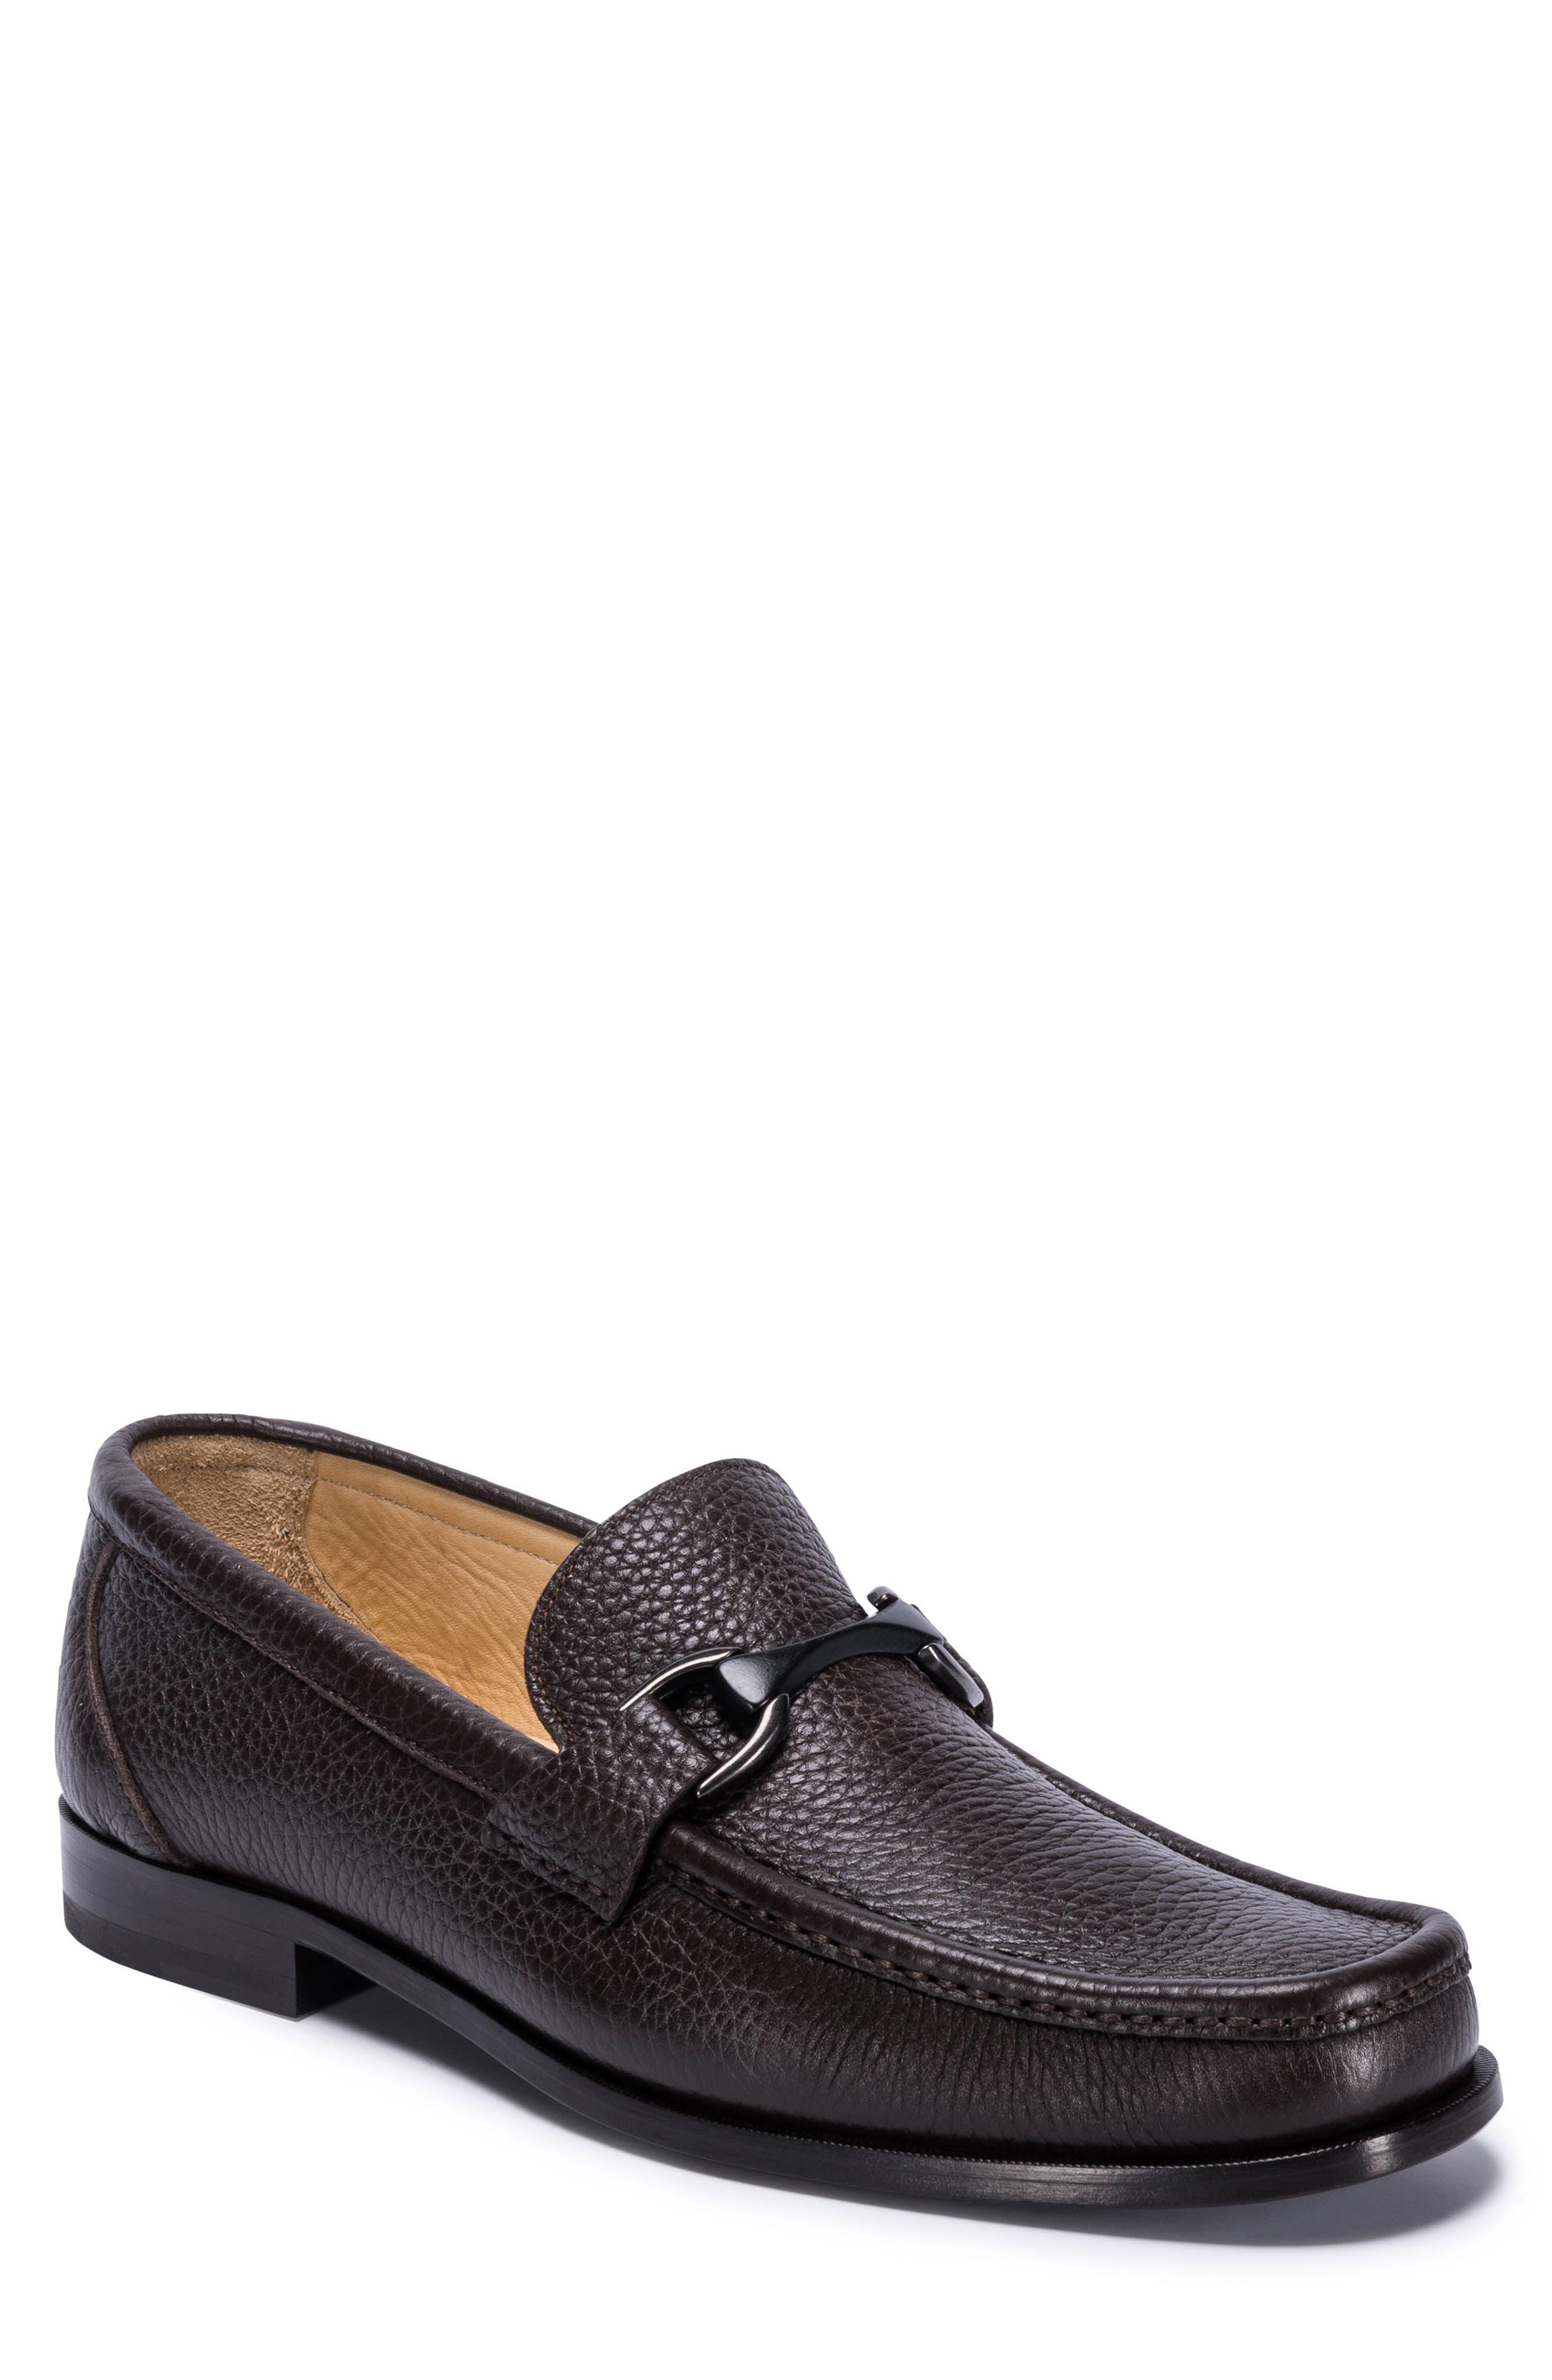 Padua Bit Loafer,                             Main thumbnail 1, color,                             Brown Leather